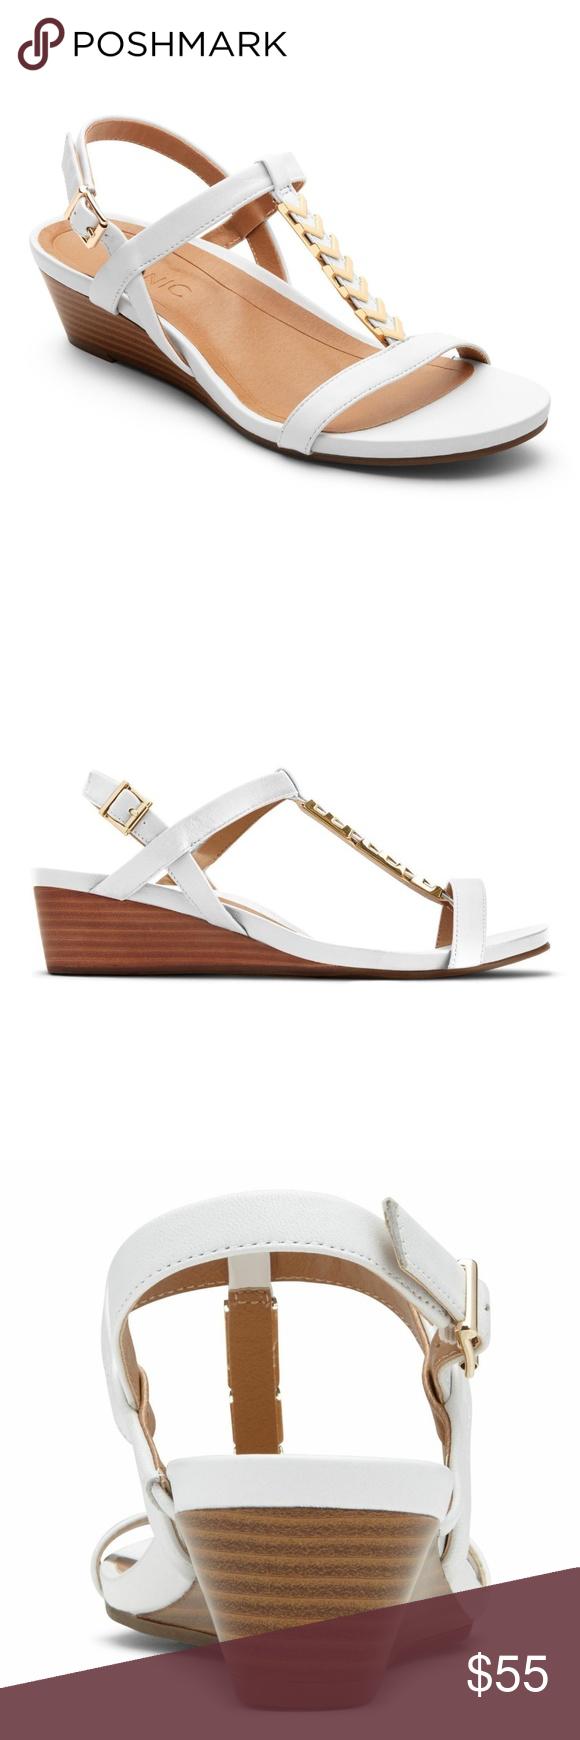 77306e2a847f Vionic Cali White T Strap Wedge Heel Sandal NEW Vionic - Womens Size  10 M